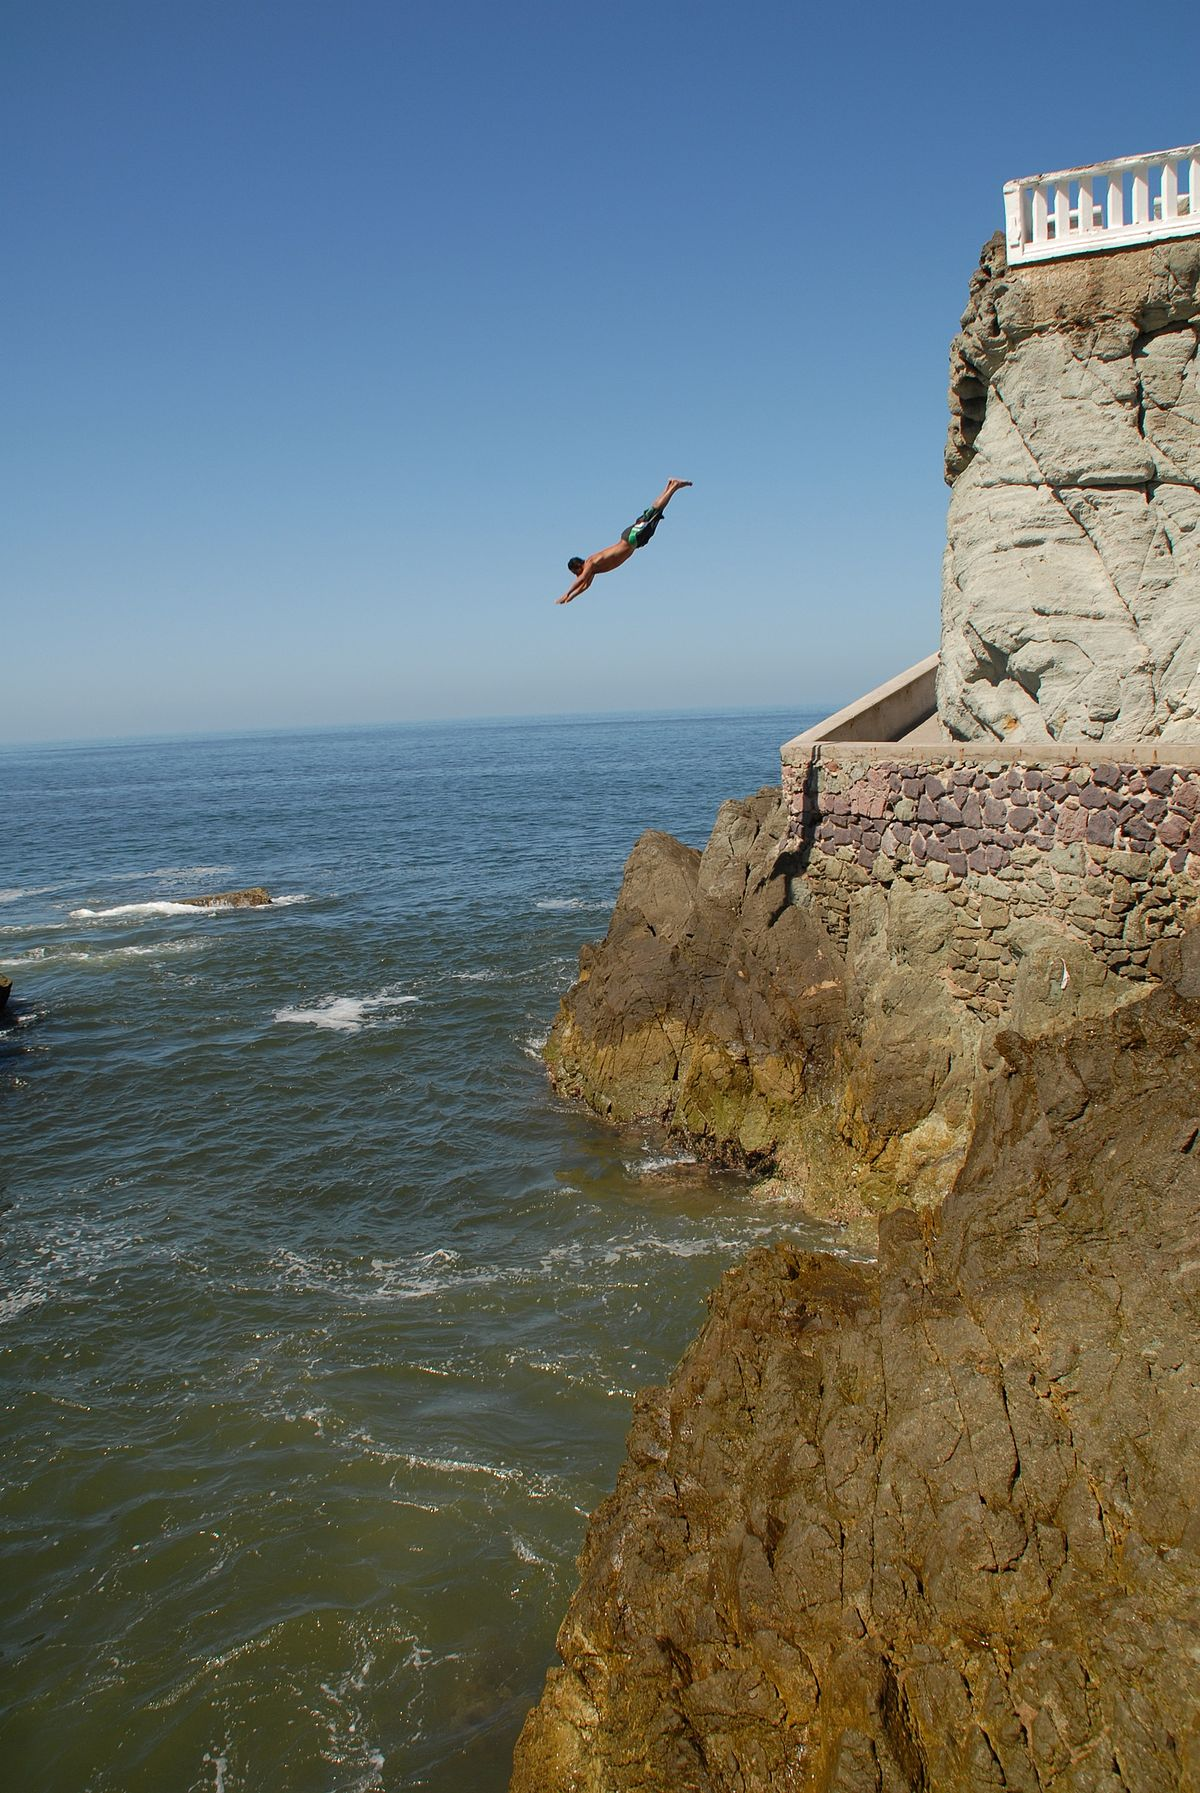 Klifduiken wikipedia - Highest cliff dive ever ...